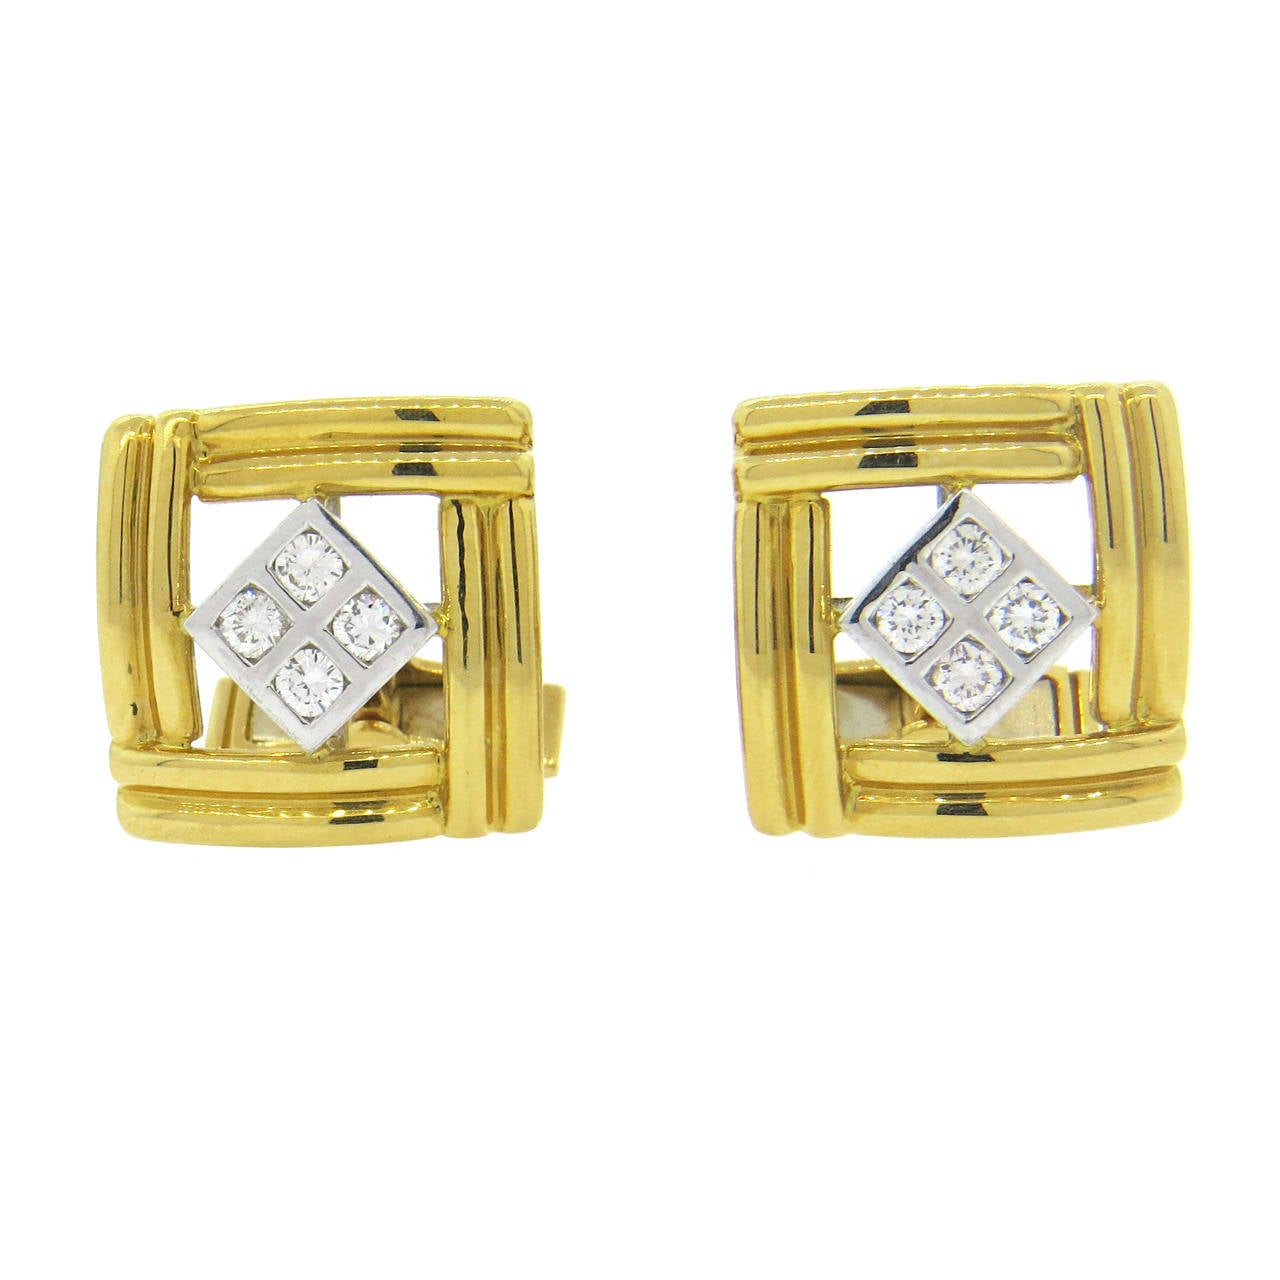 Diamond and Gold Cufflinks